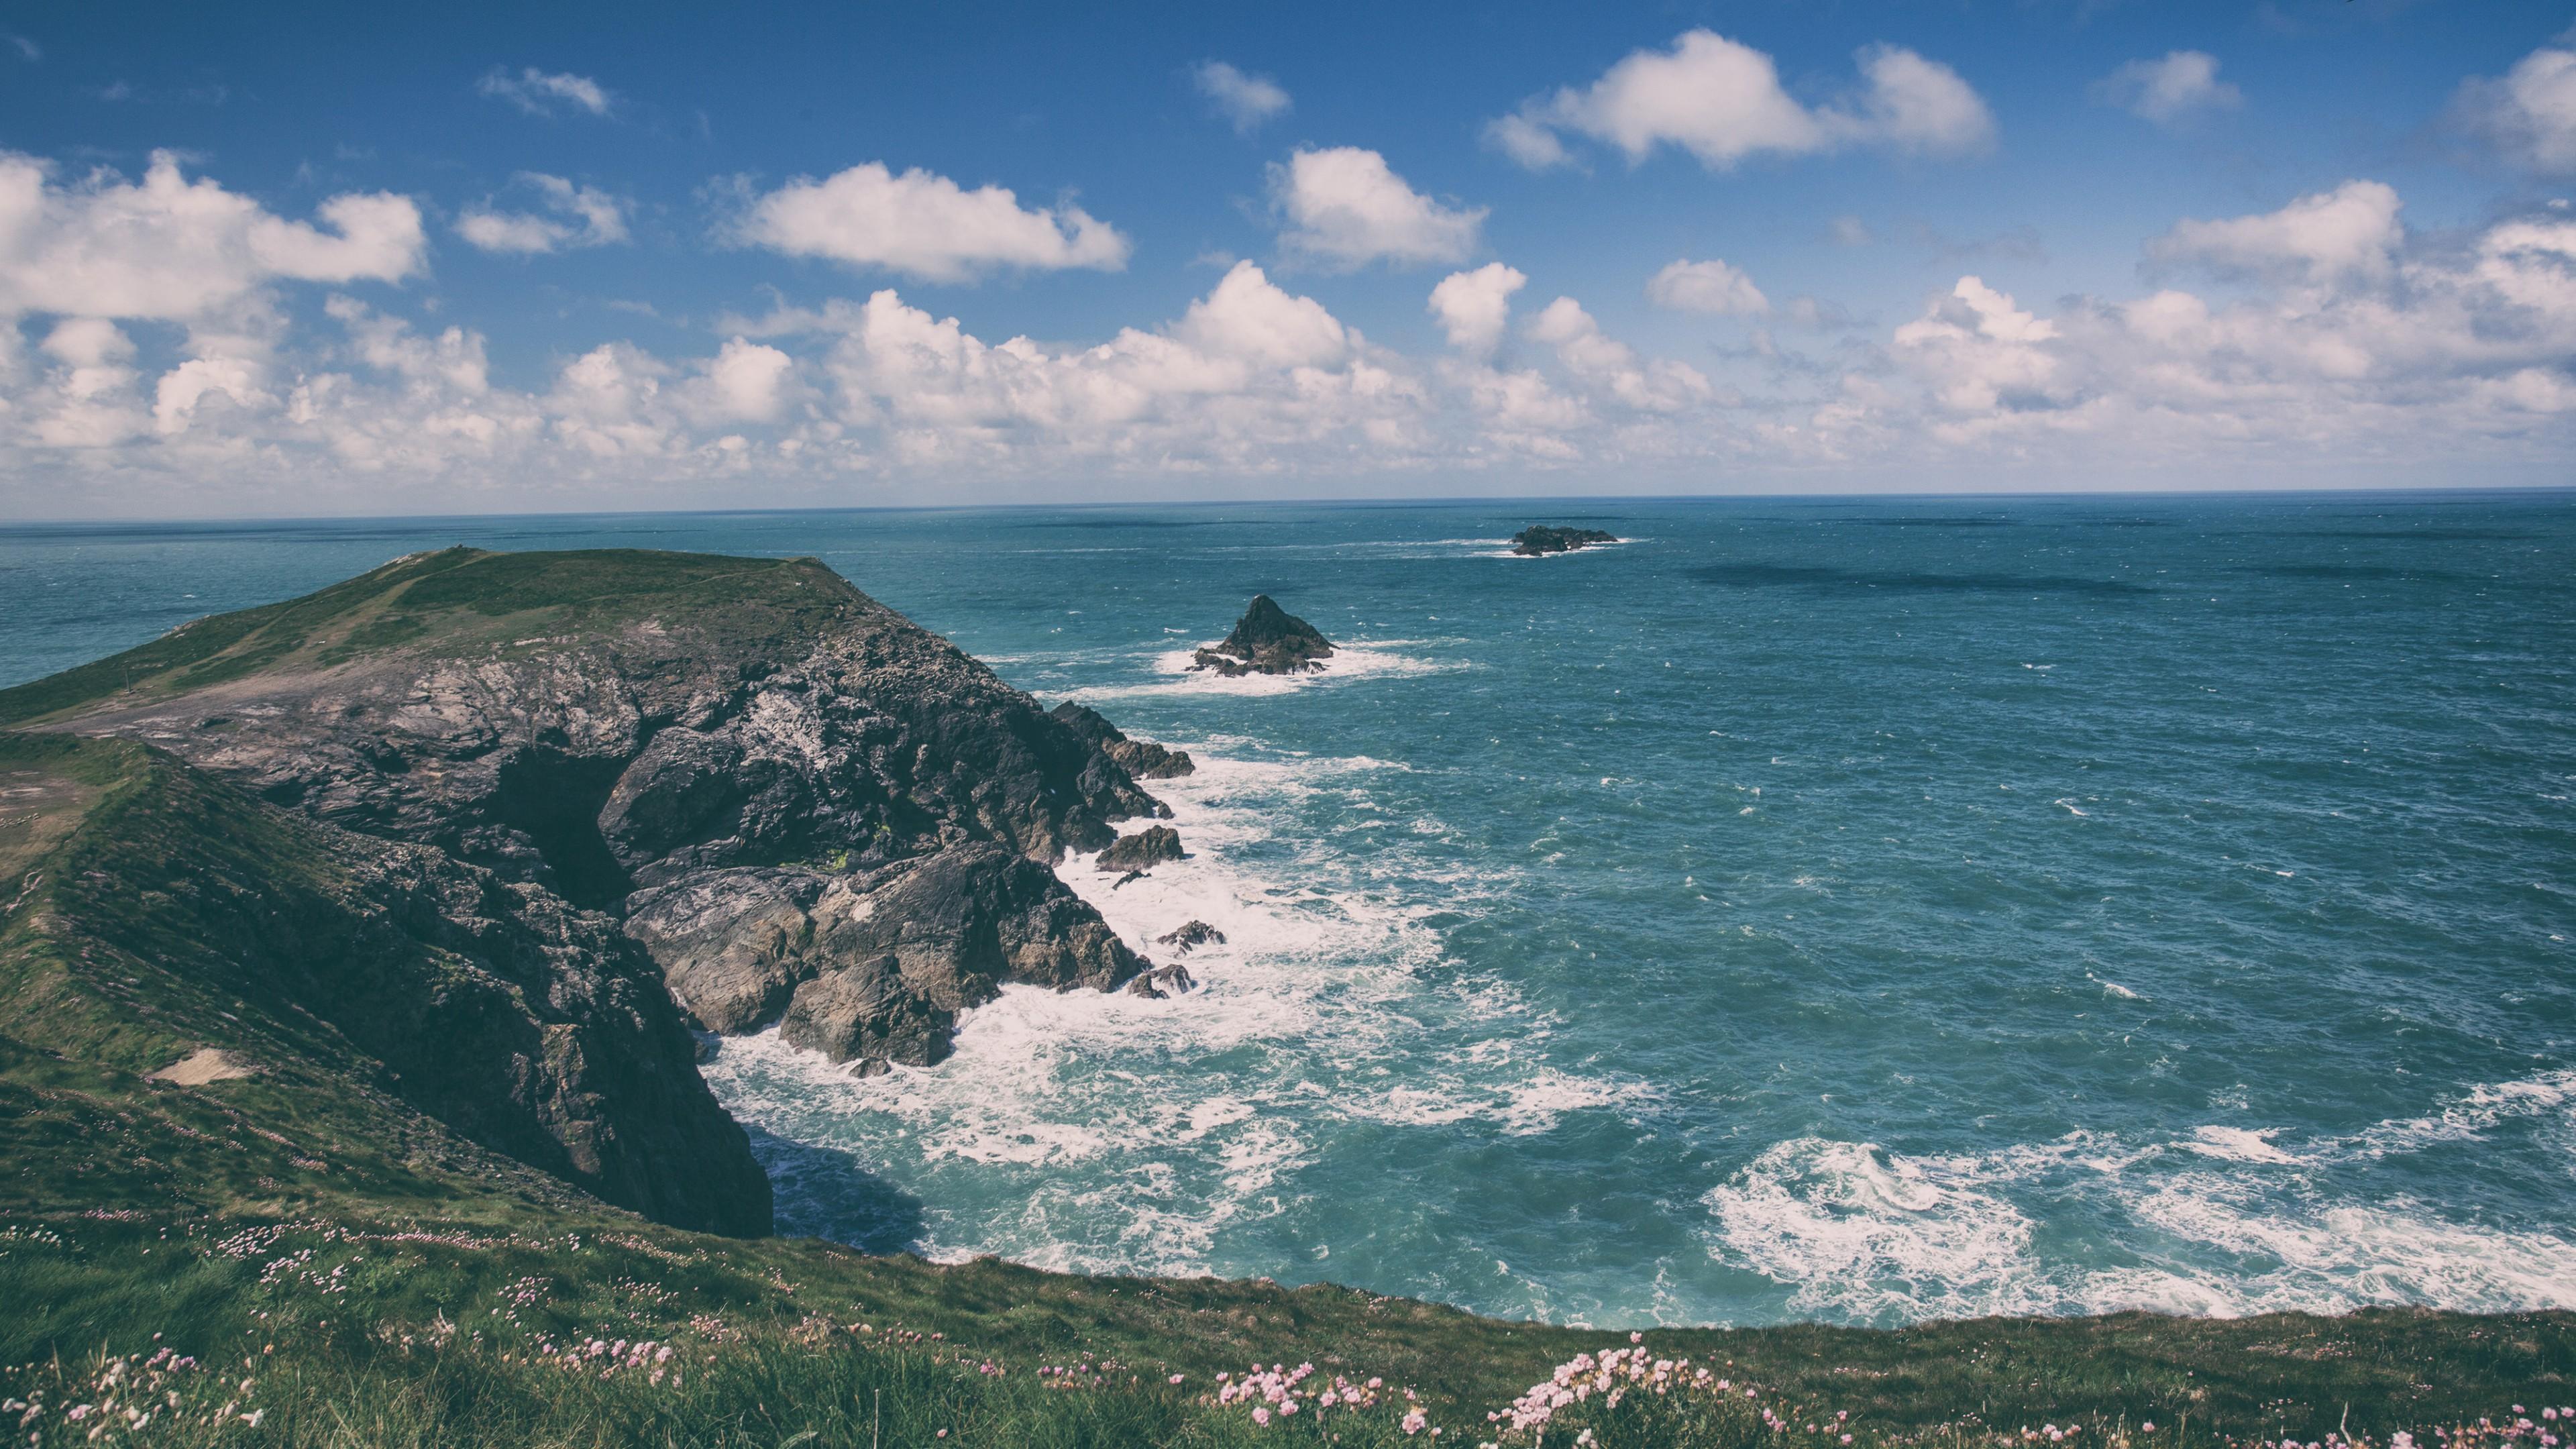 Wallpaper Cornwall 5k 4k wallpaper England coastline rocks 3840x2160